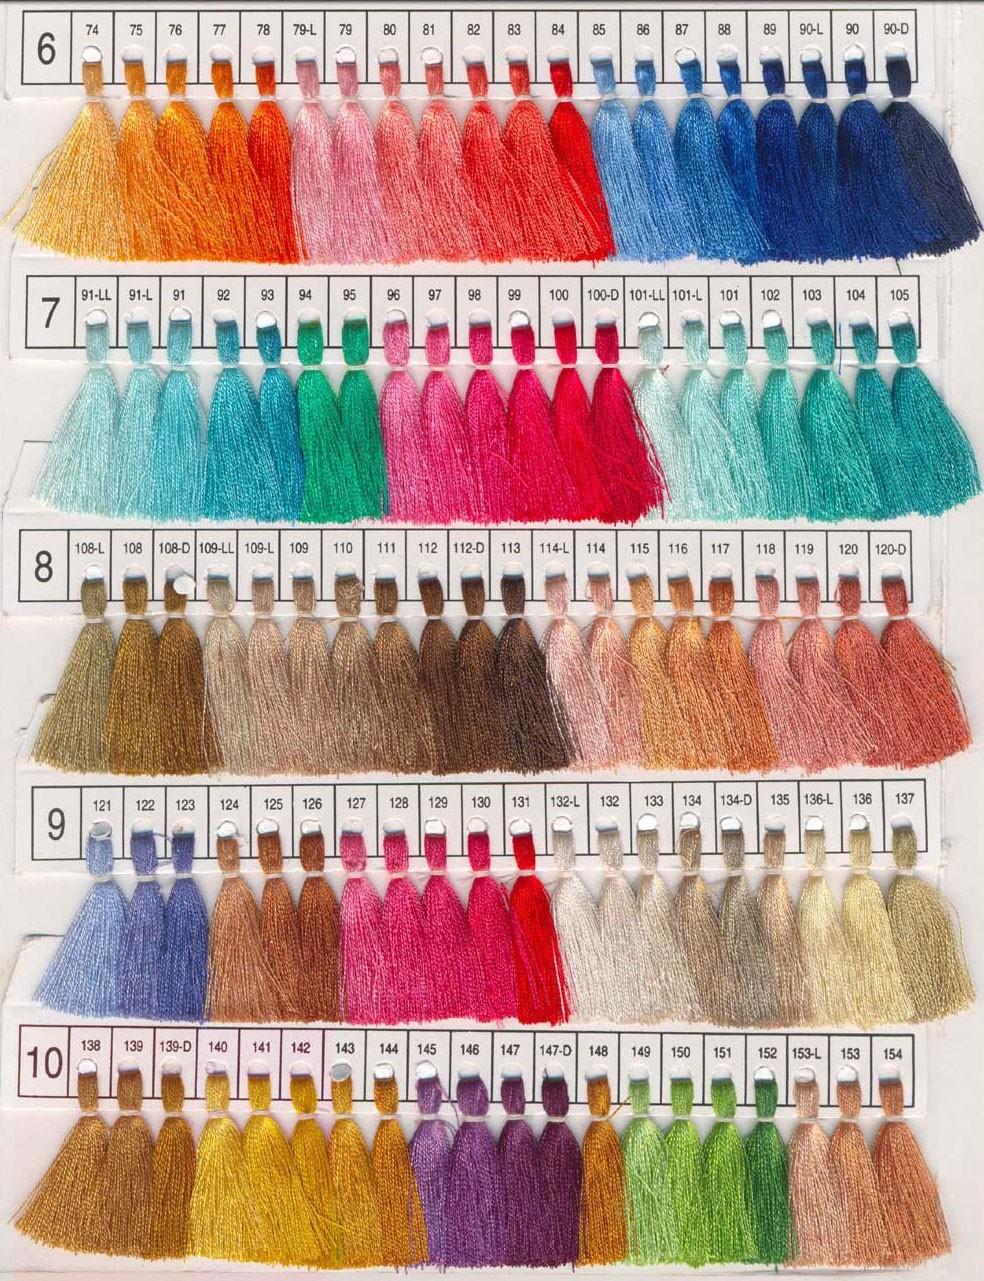 Pashmina Color Chart 2